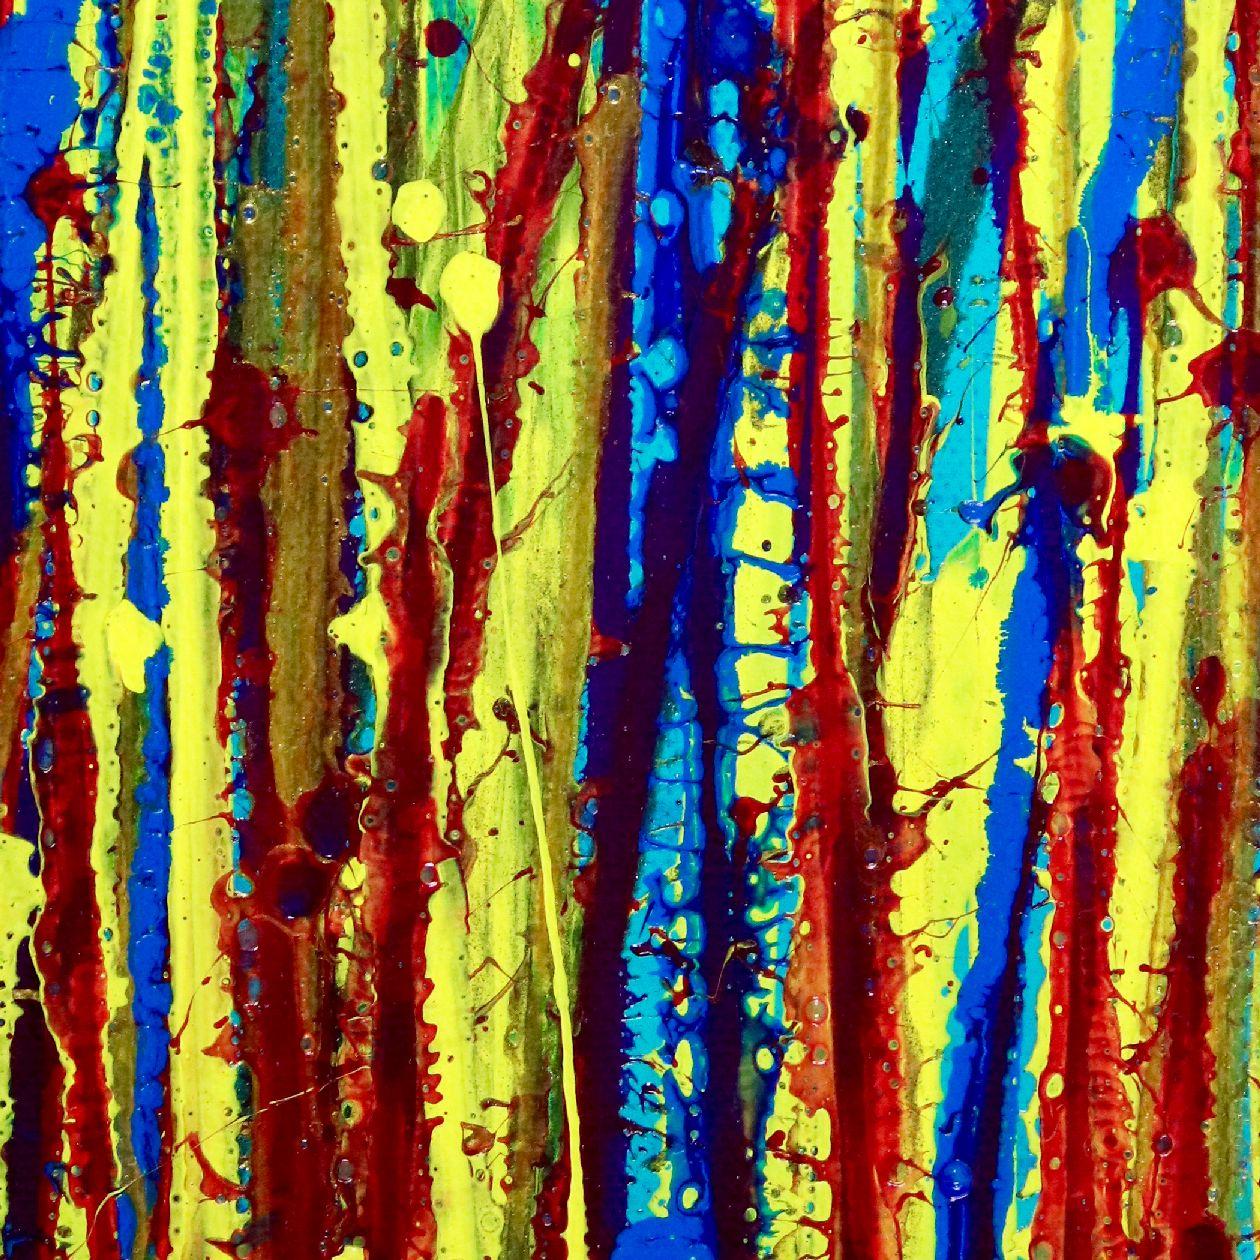 SOLD - Shimmering Garden 2 (Flow State) by Nestor Toro